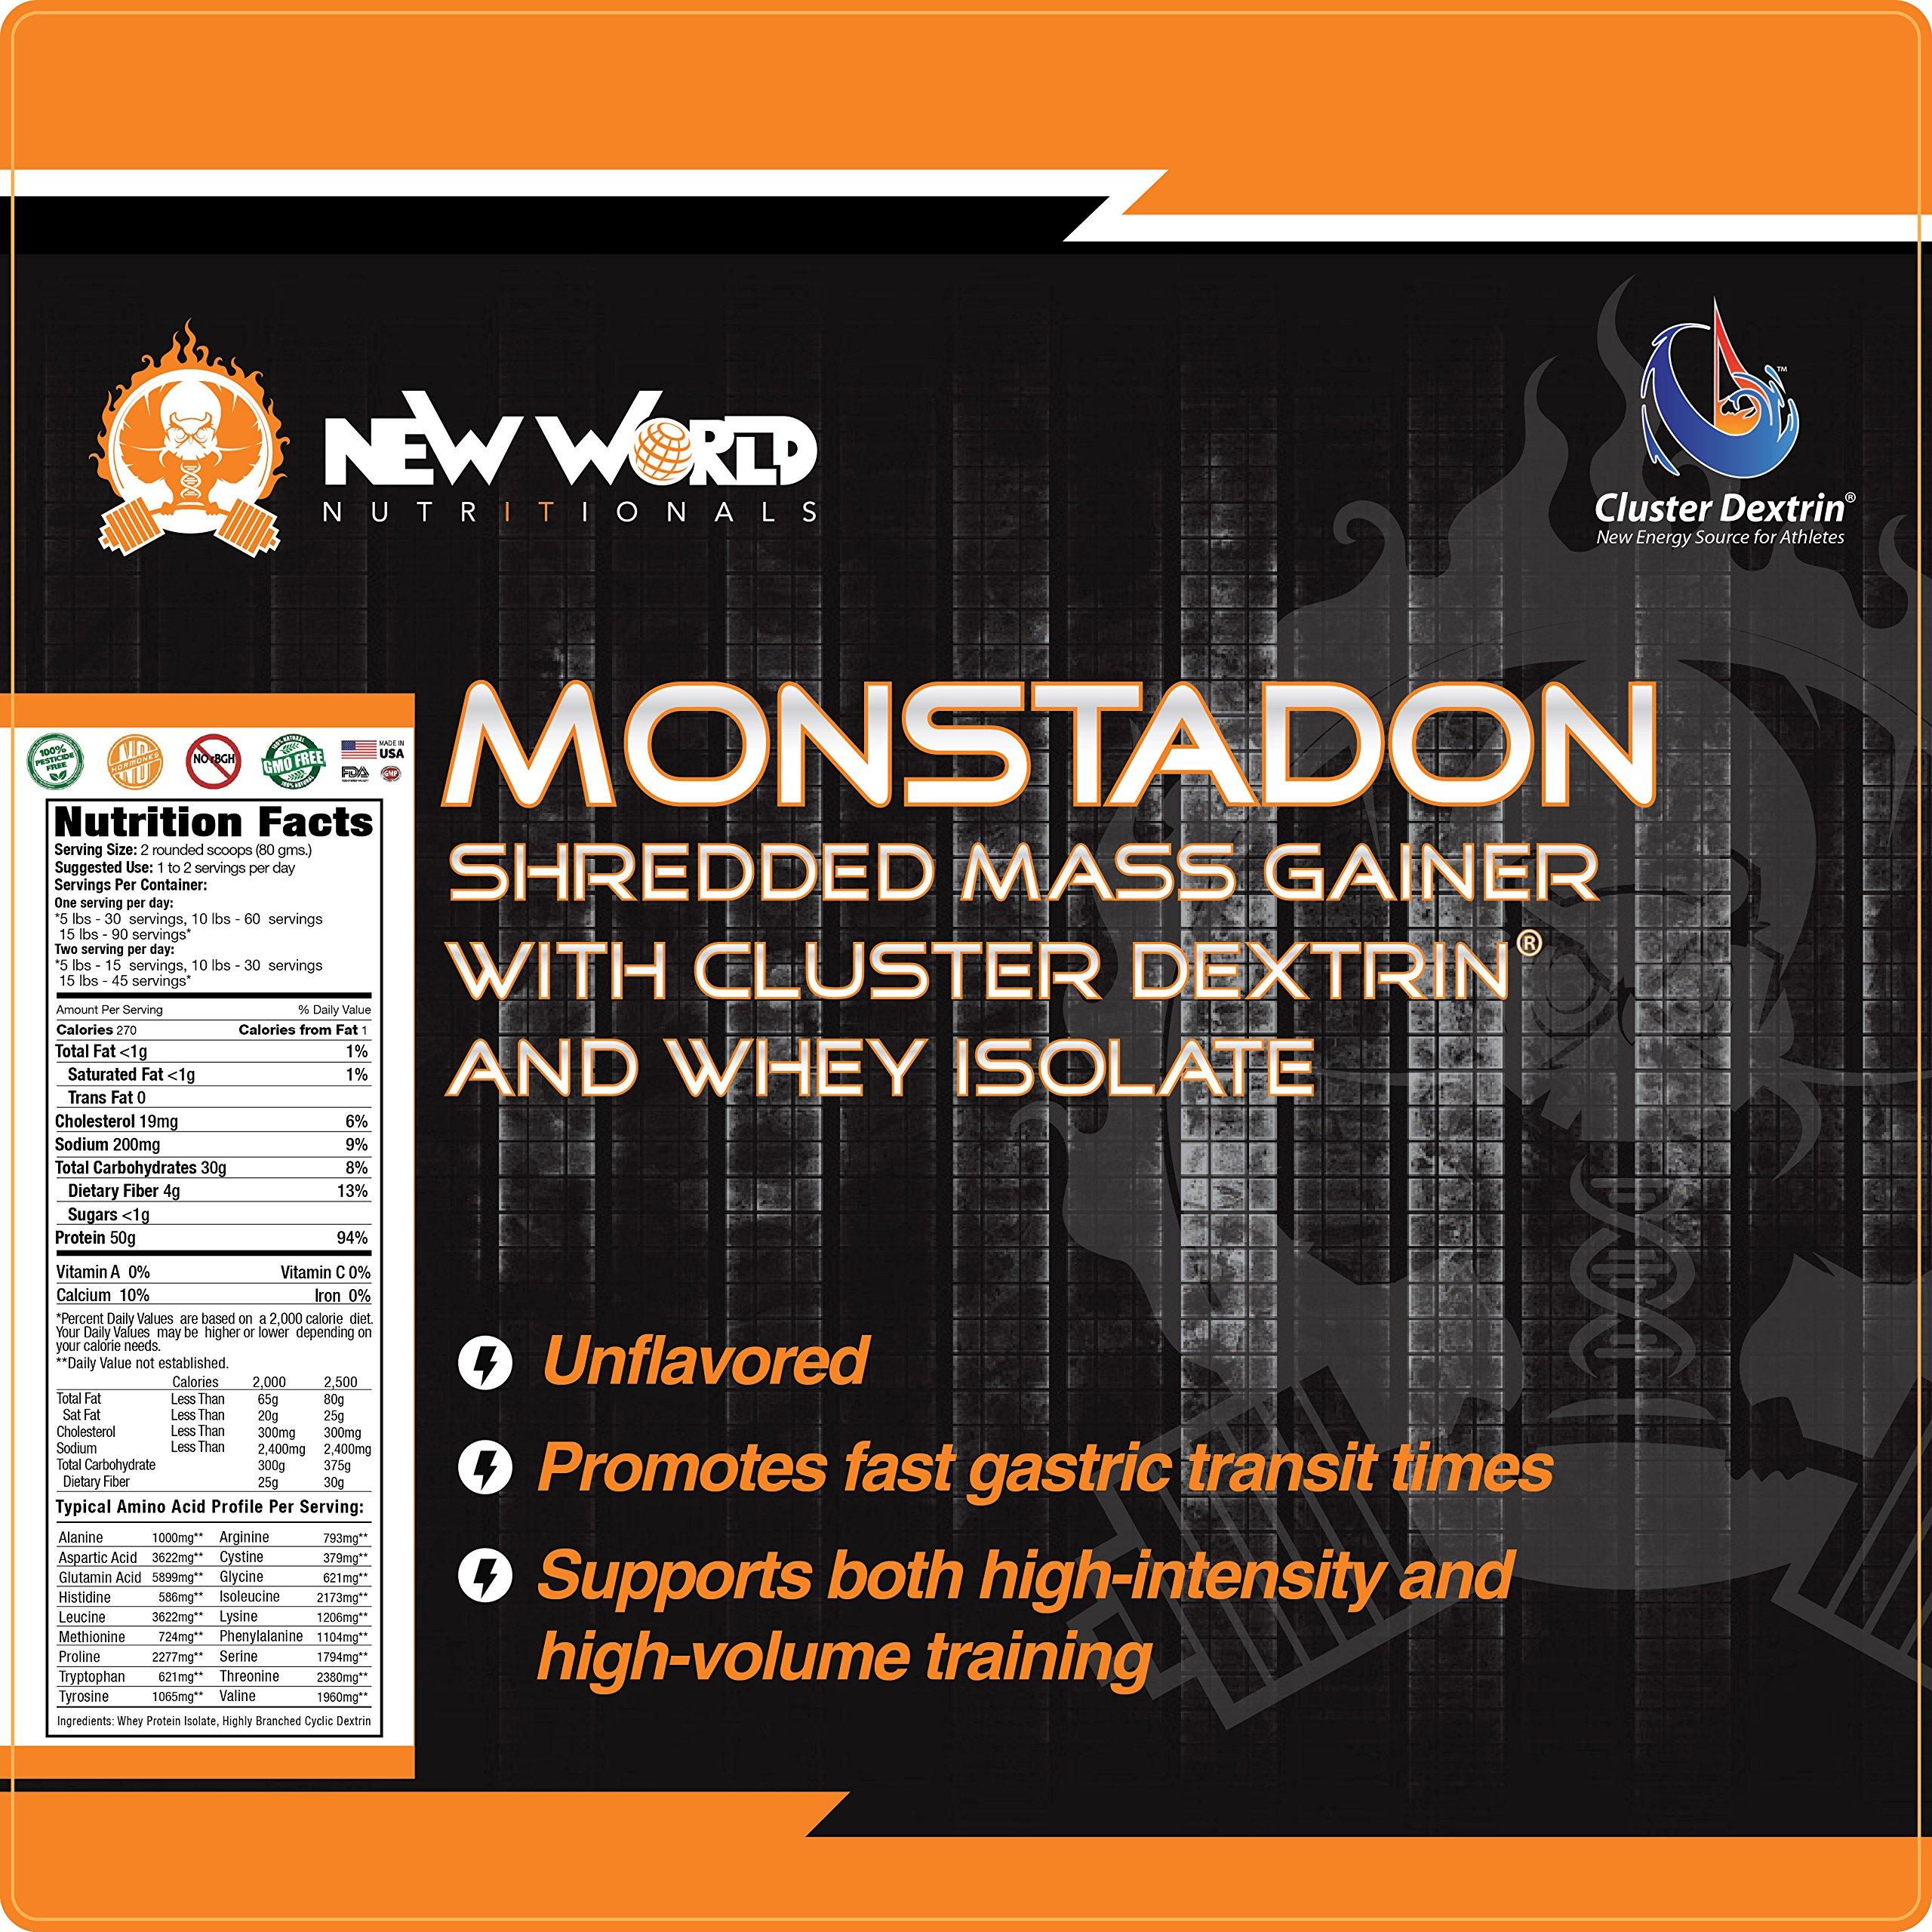 New World Nutritionals 100% Natural Weight Gainer Monstadon-Whey Isolate & Cluster Dextrin®, Non-GMO, No-Additives (Vanilla, 7)